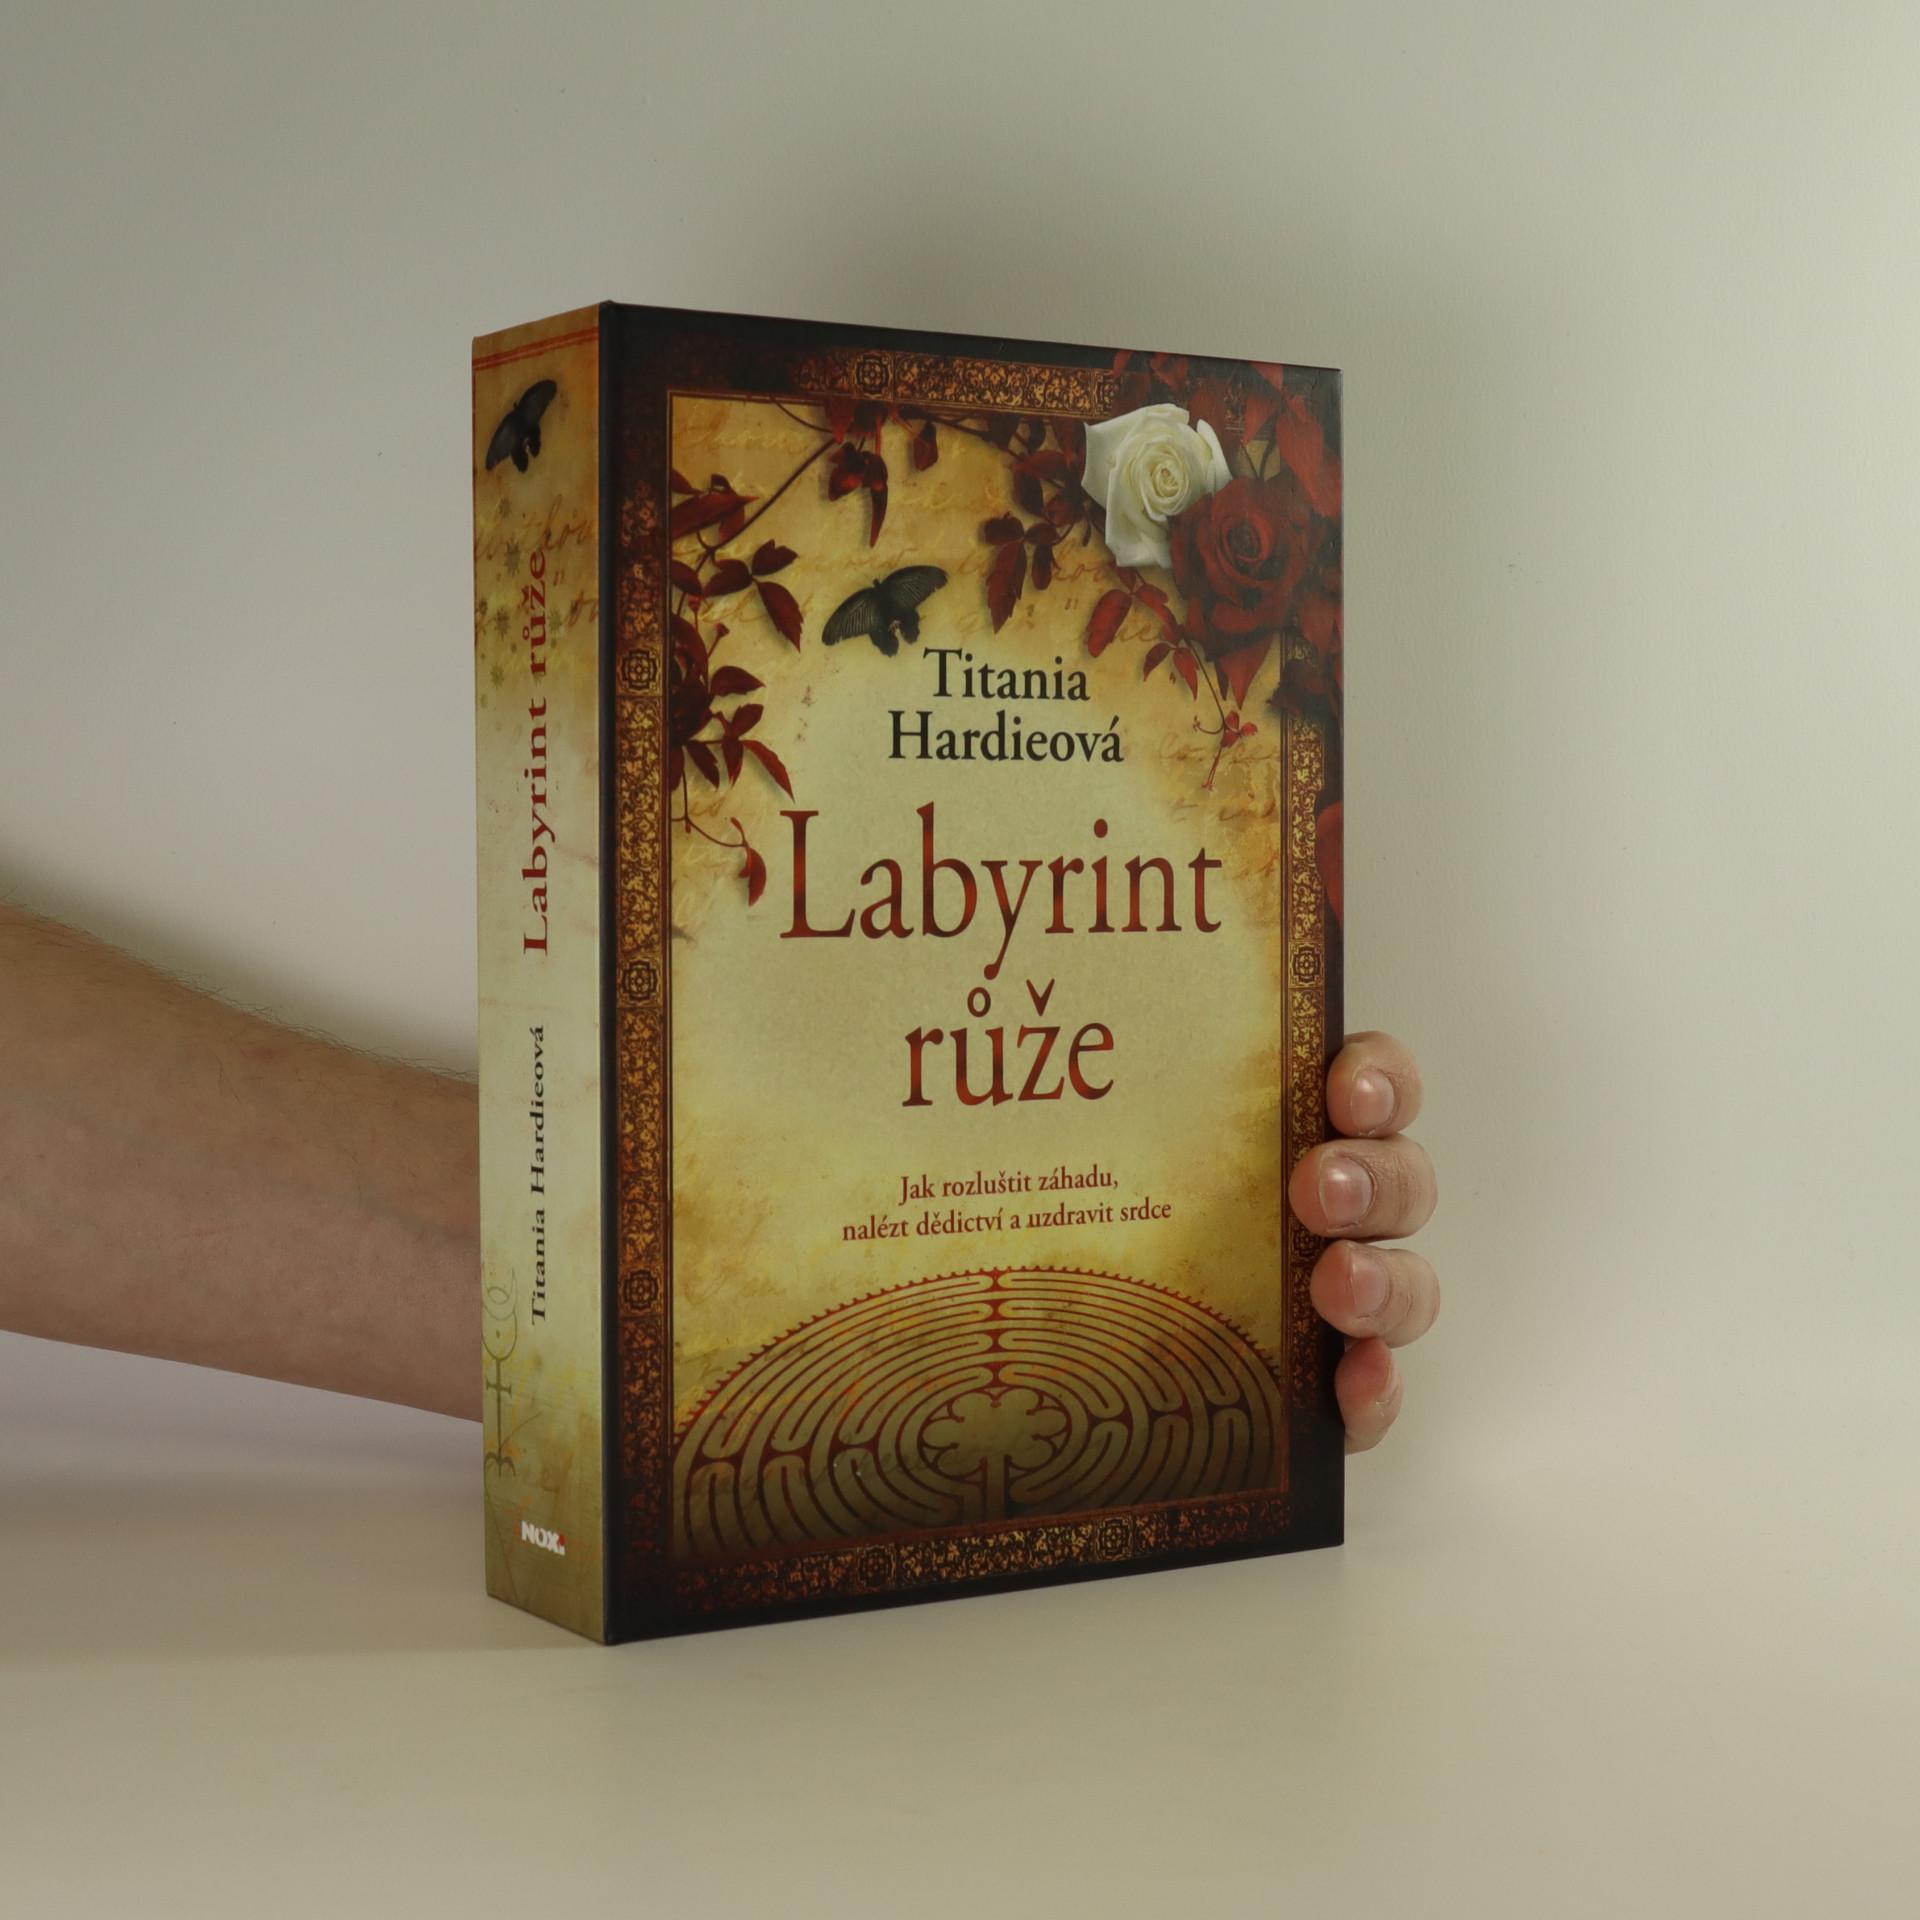 antikvární kniha Labyrint růže, 2008